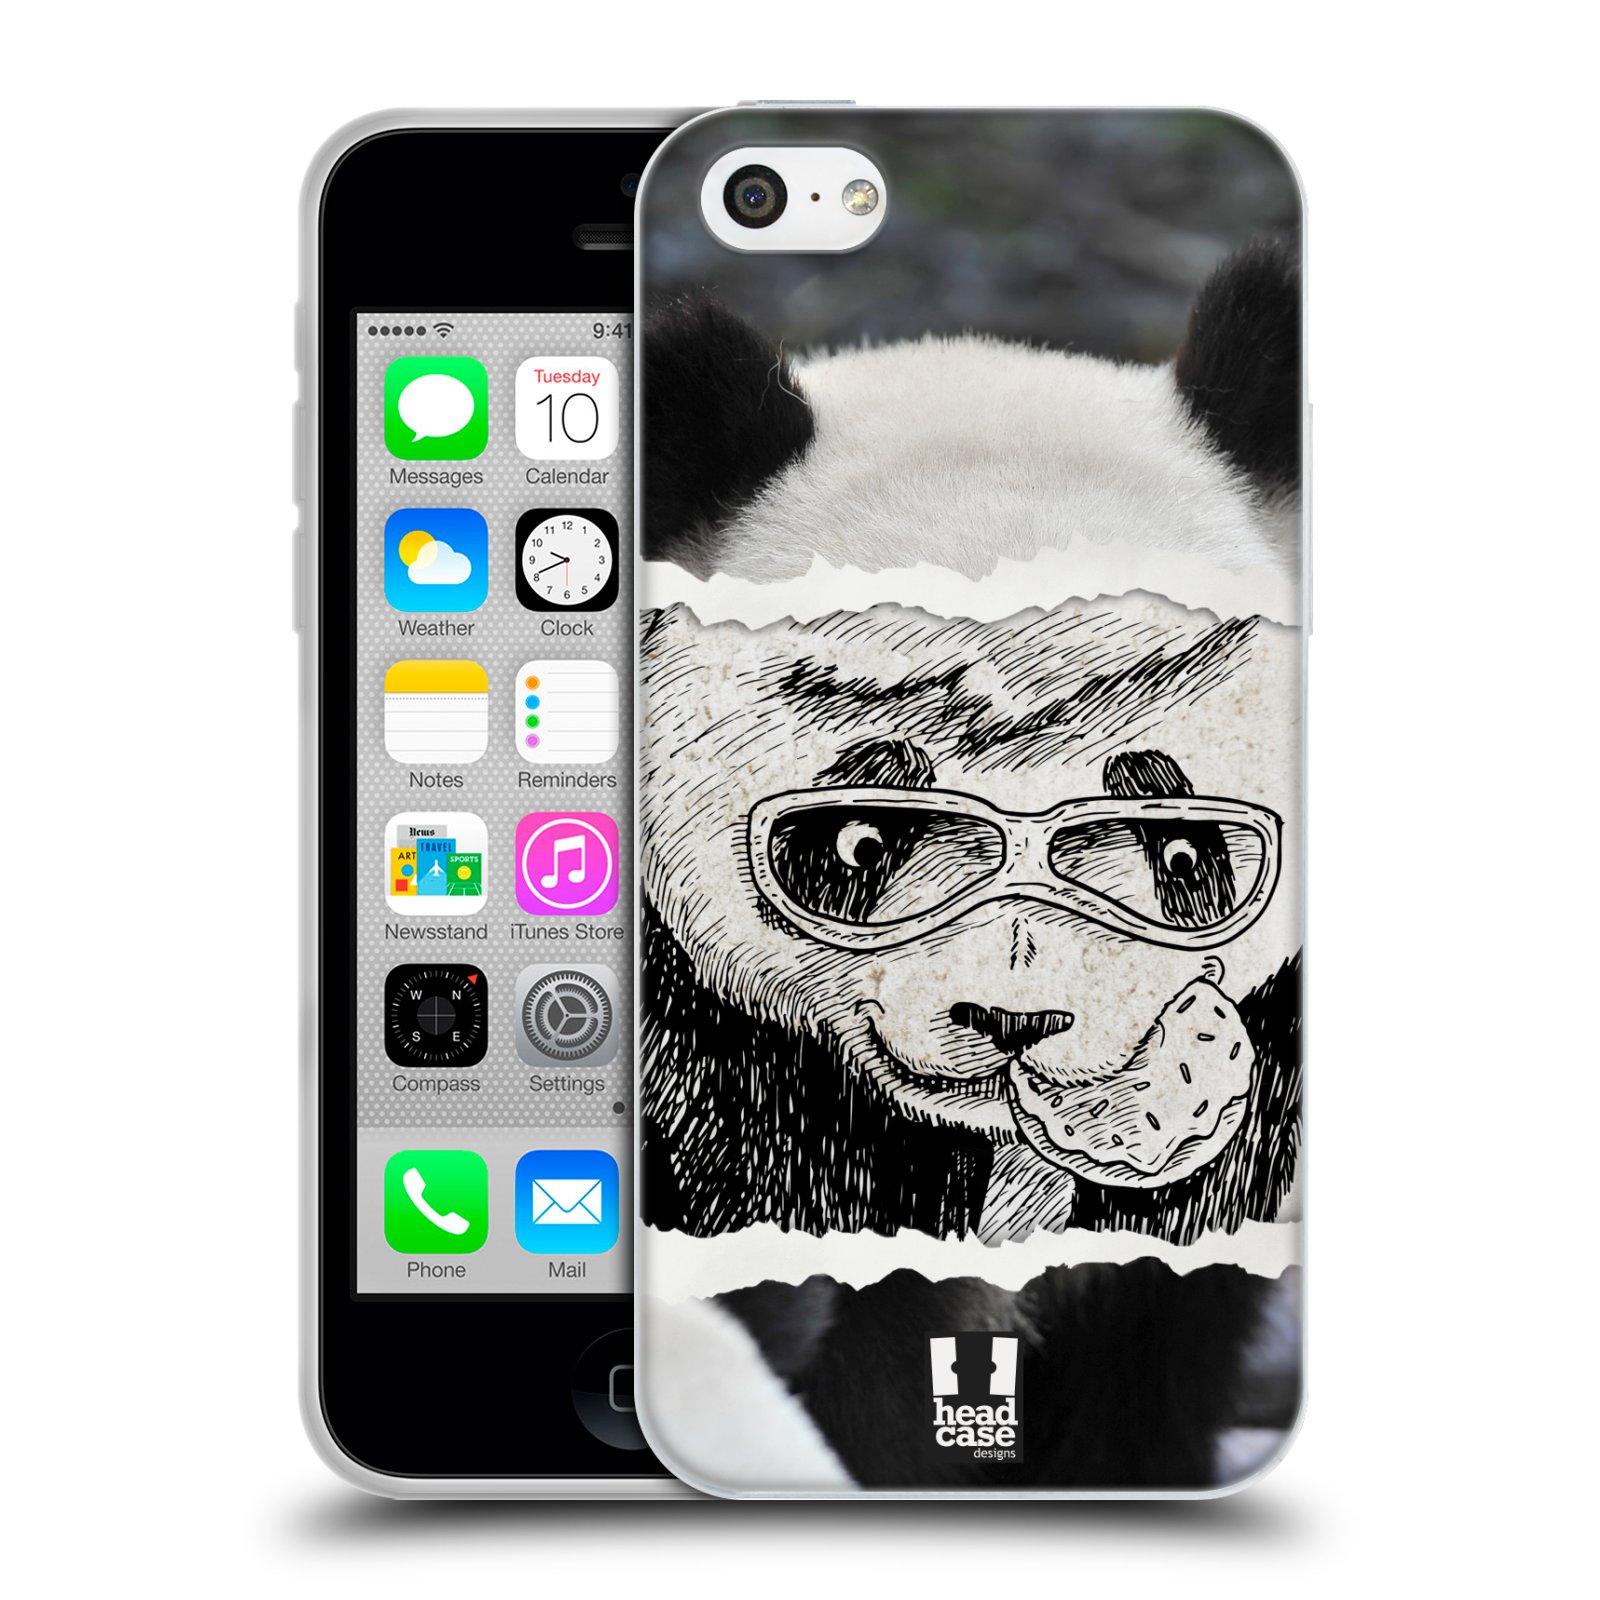 HEAD CASE silikonový obal na mobil Apple Iphone 5C vzor zvířata koláž roztomilá panda